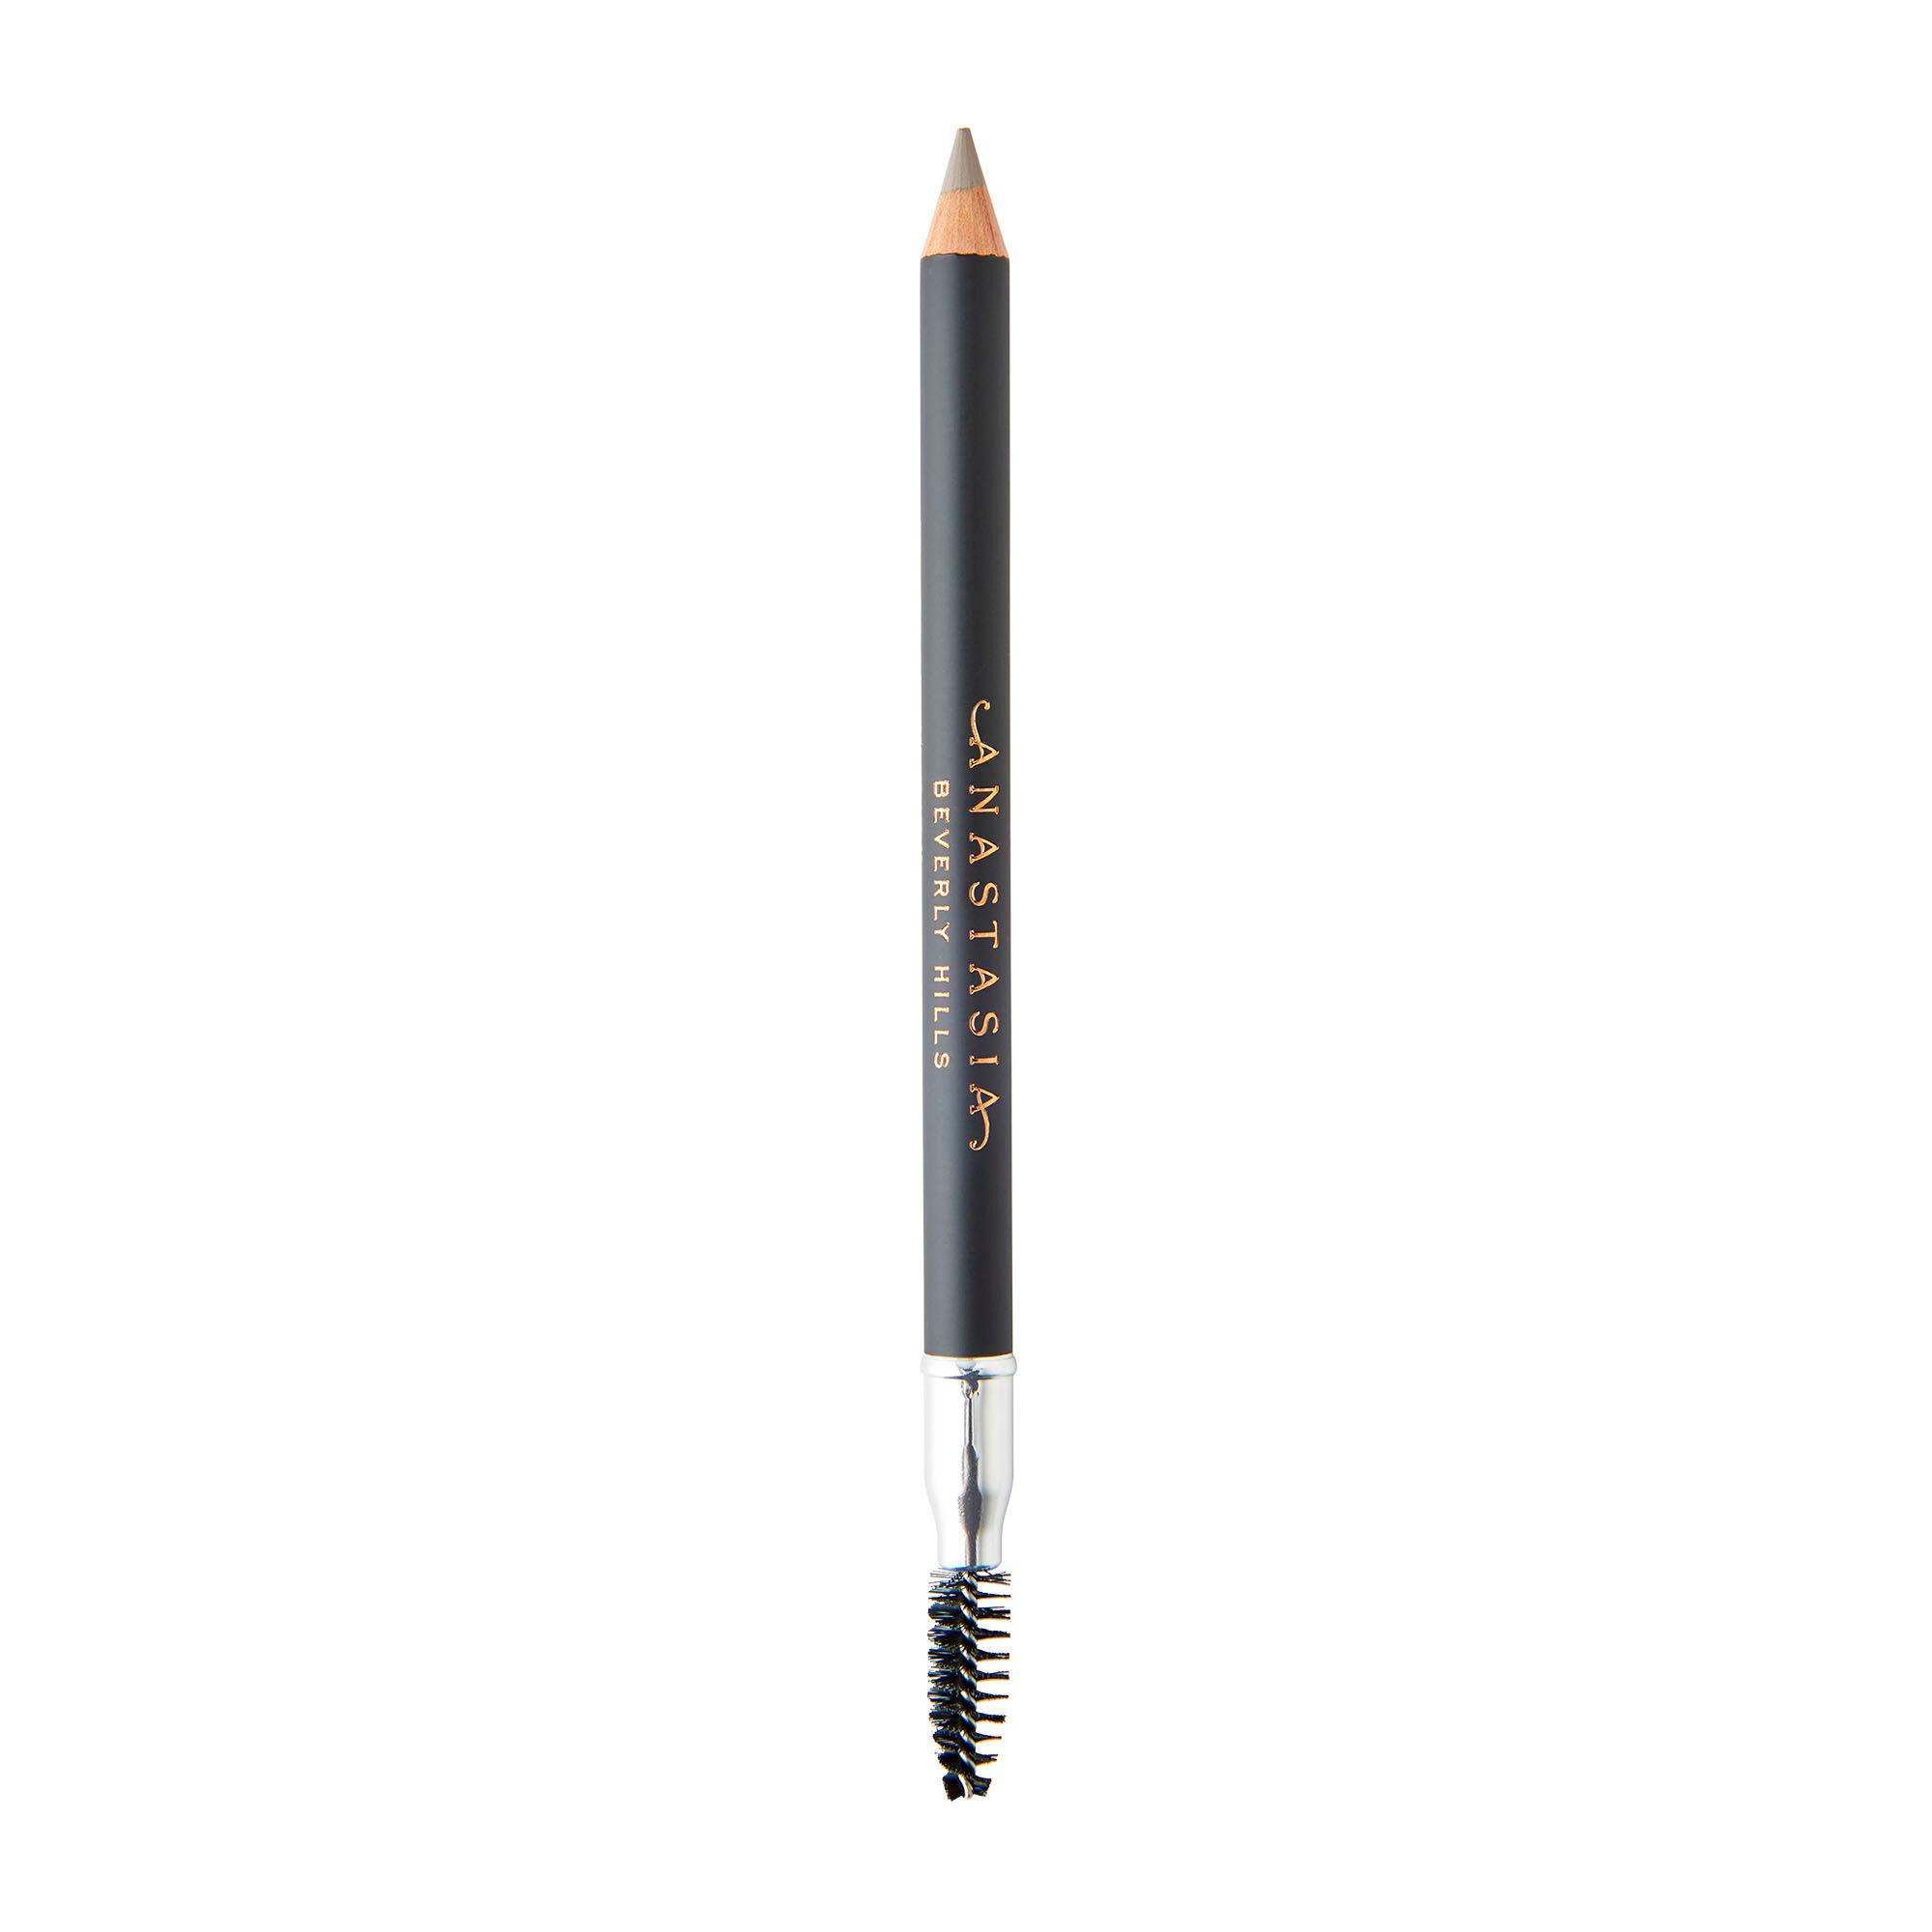 Anastasia Beverly Hills Crayon Perfect Brow Pencil Auburn Taupe 1.05g